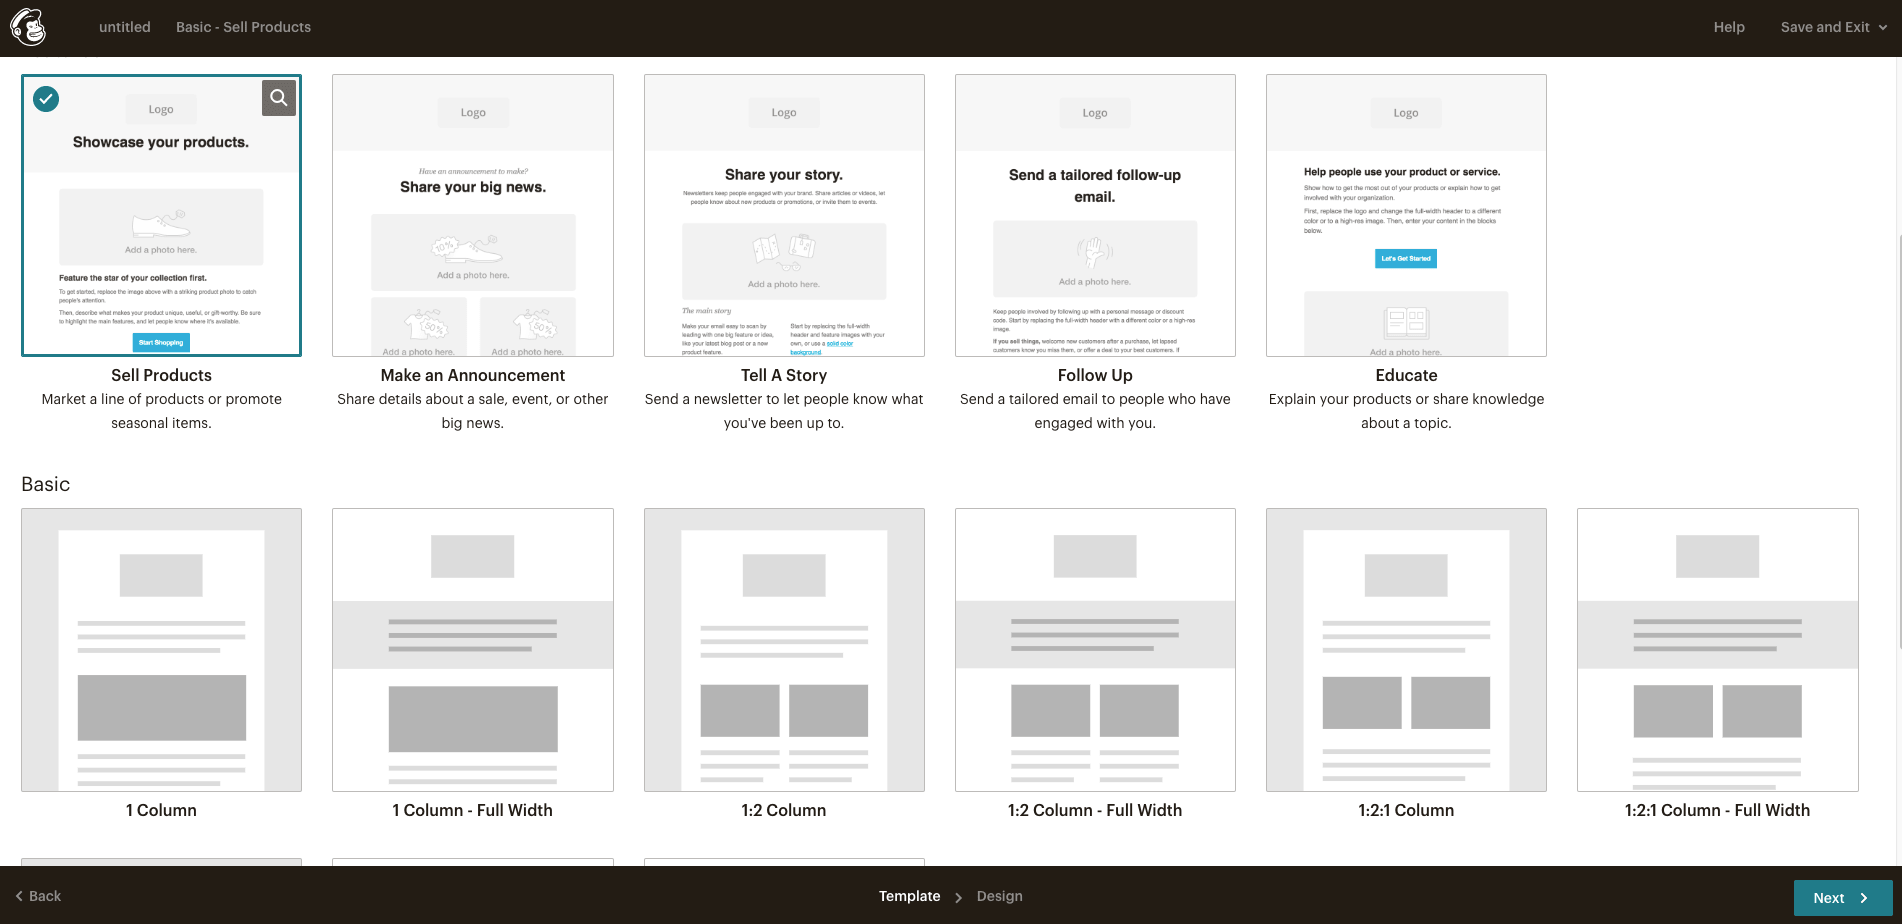 hubspot-vs-mailchimp-Featured-image-1